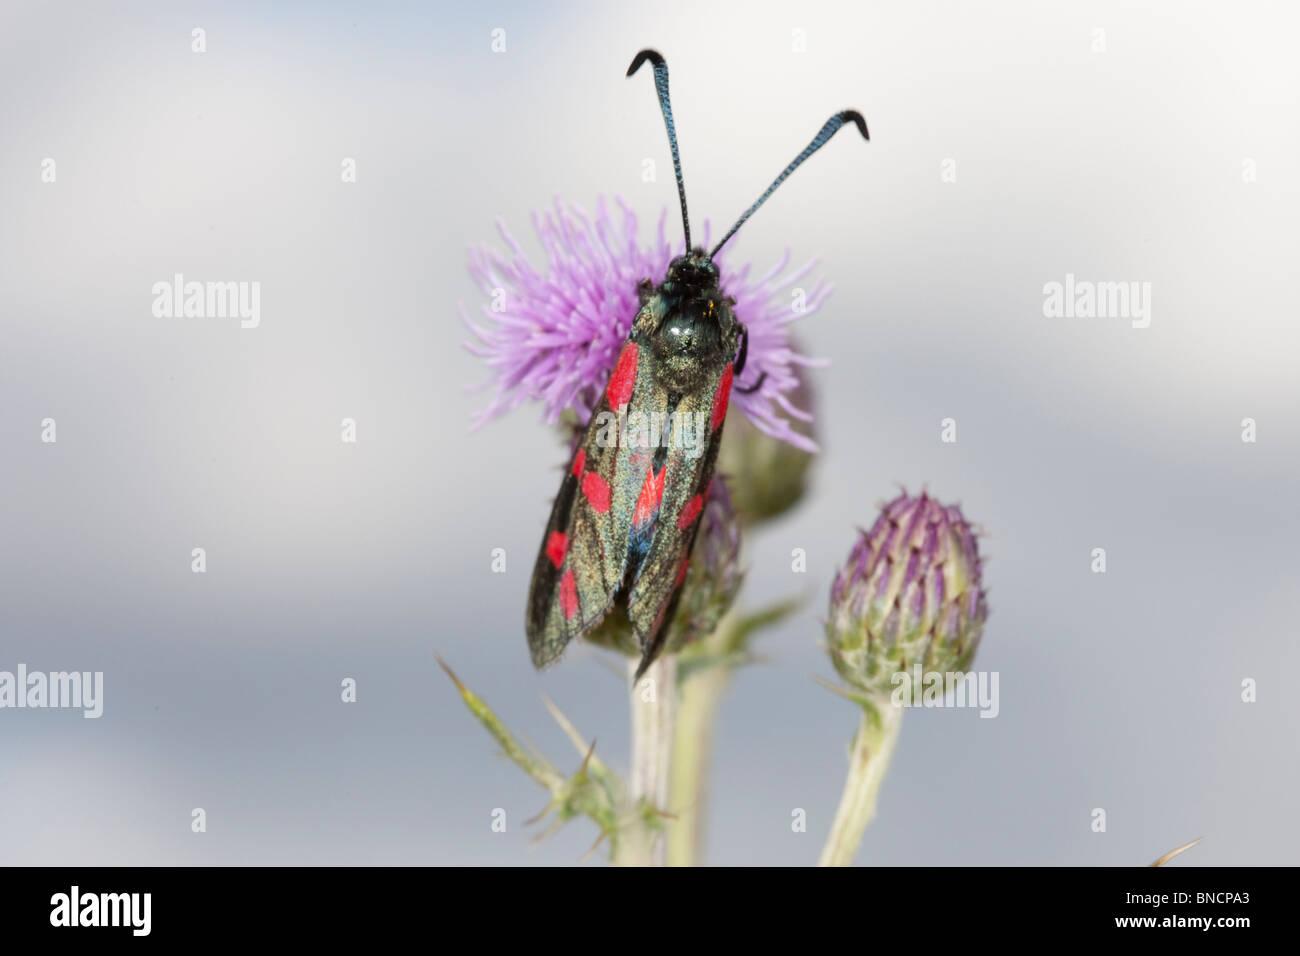 Adult cinnabar moth on flower. - Stock Image